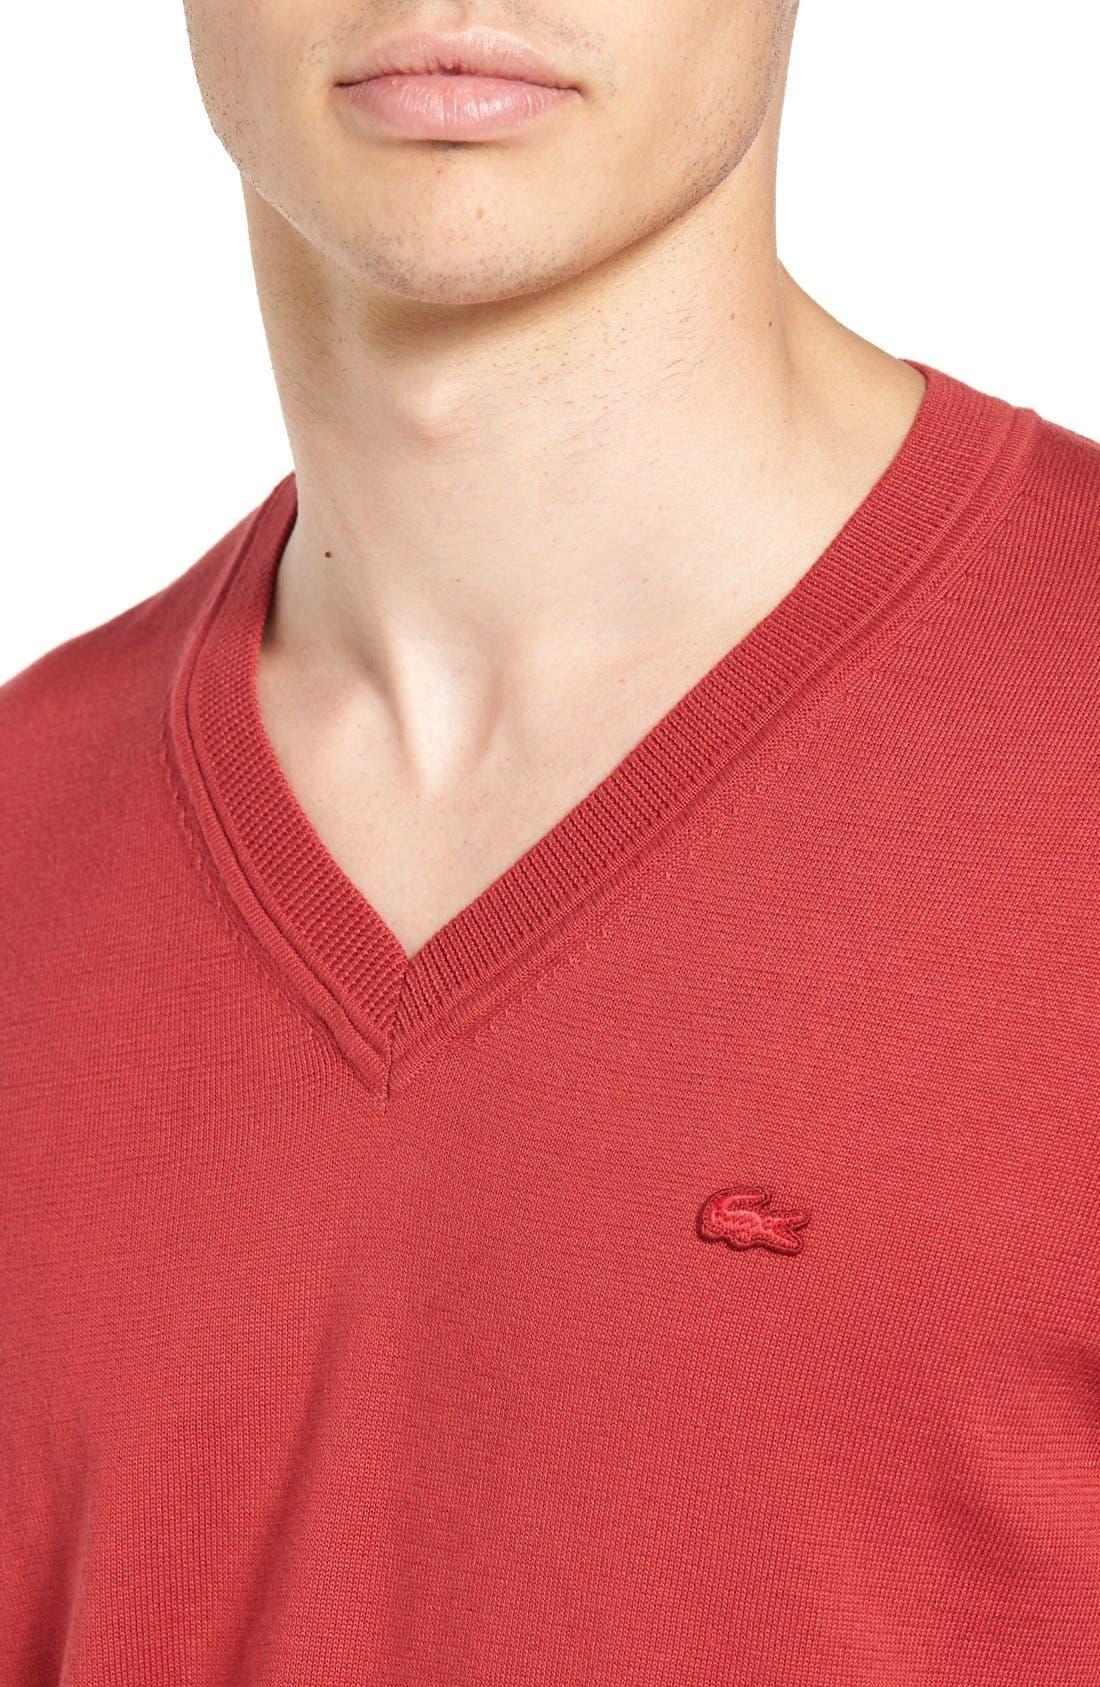 Cotton Jersey V-Neck Sweater,                             Alternate thumbnail 24, color,